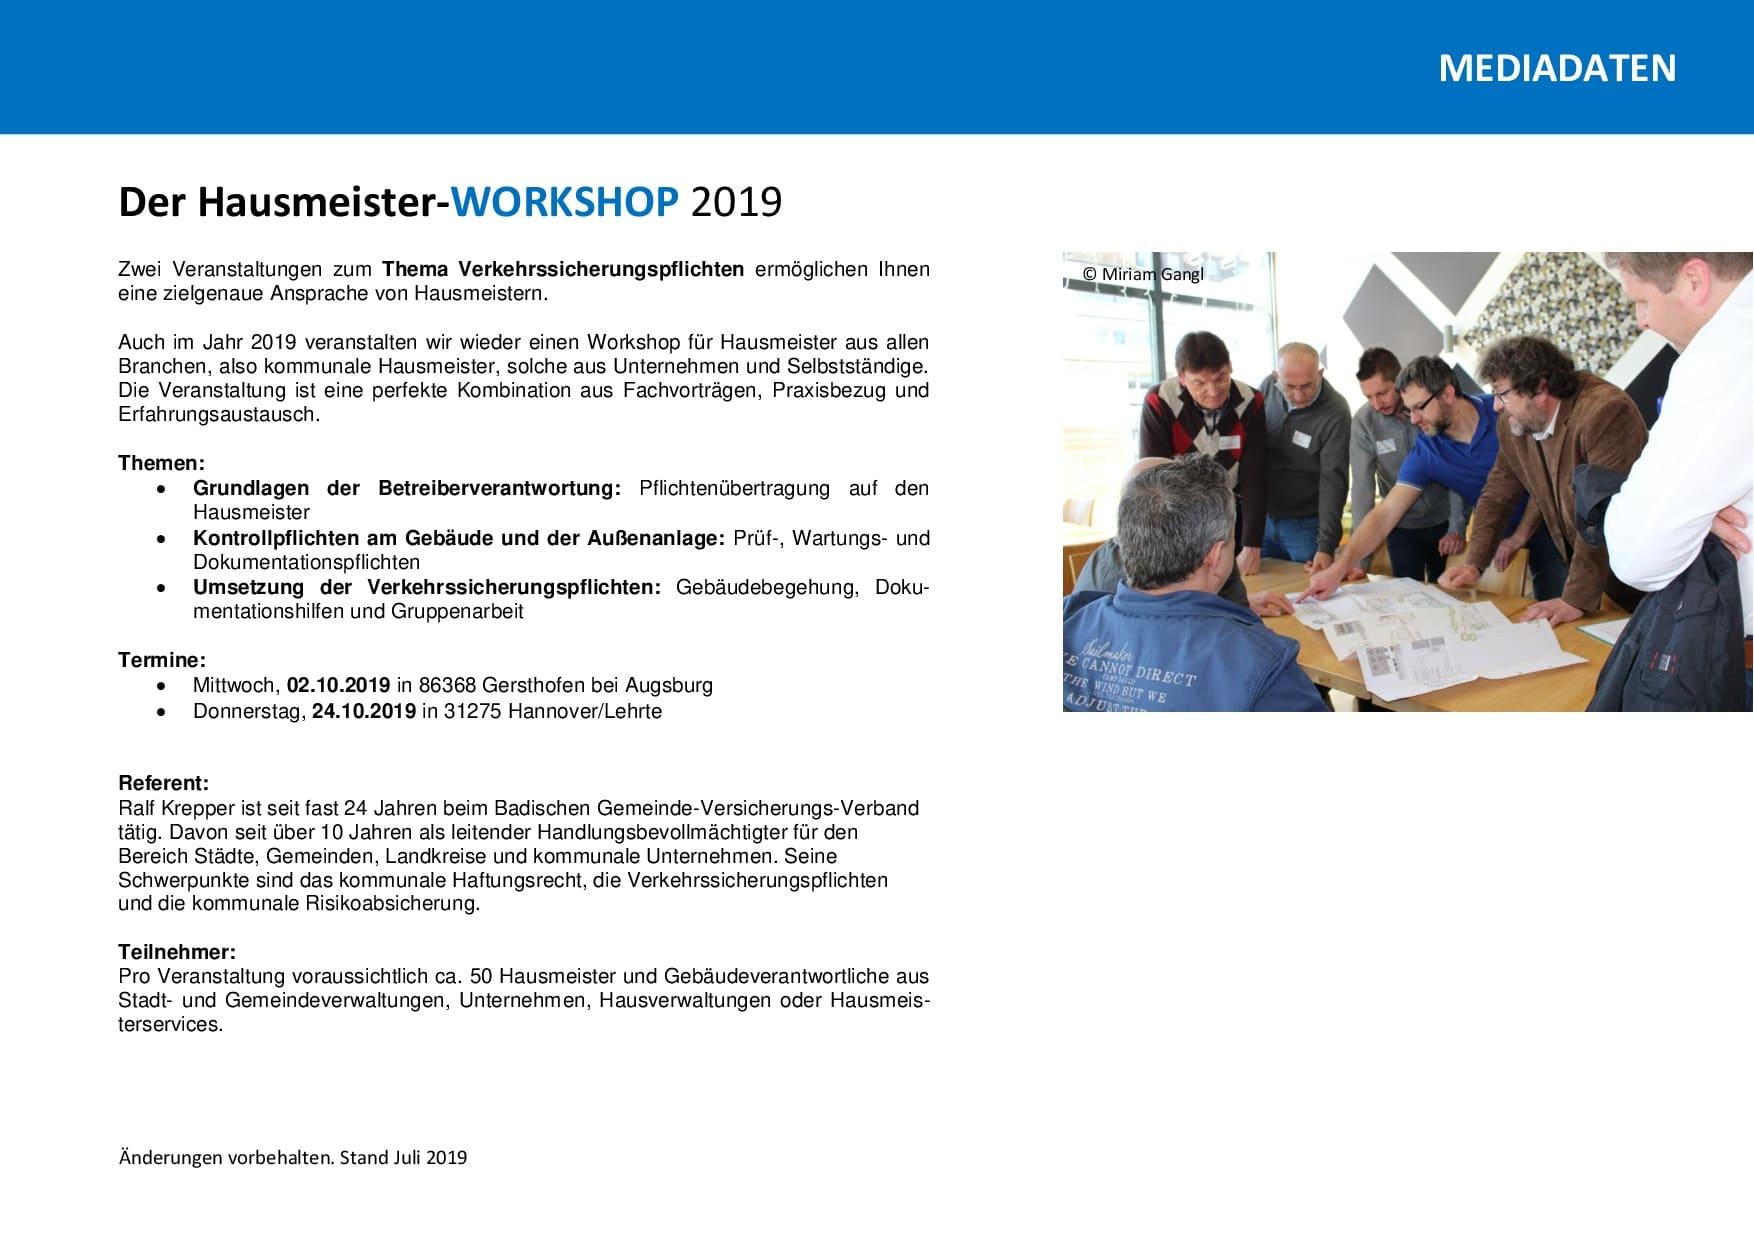 Mediadaten Workshop 2019